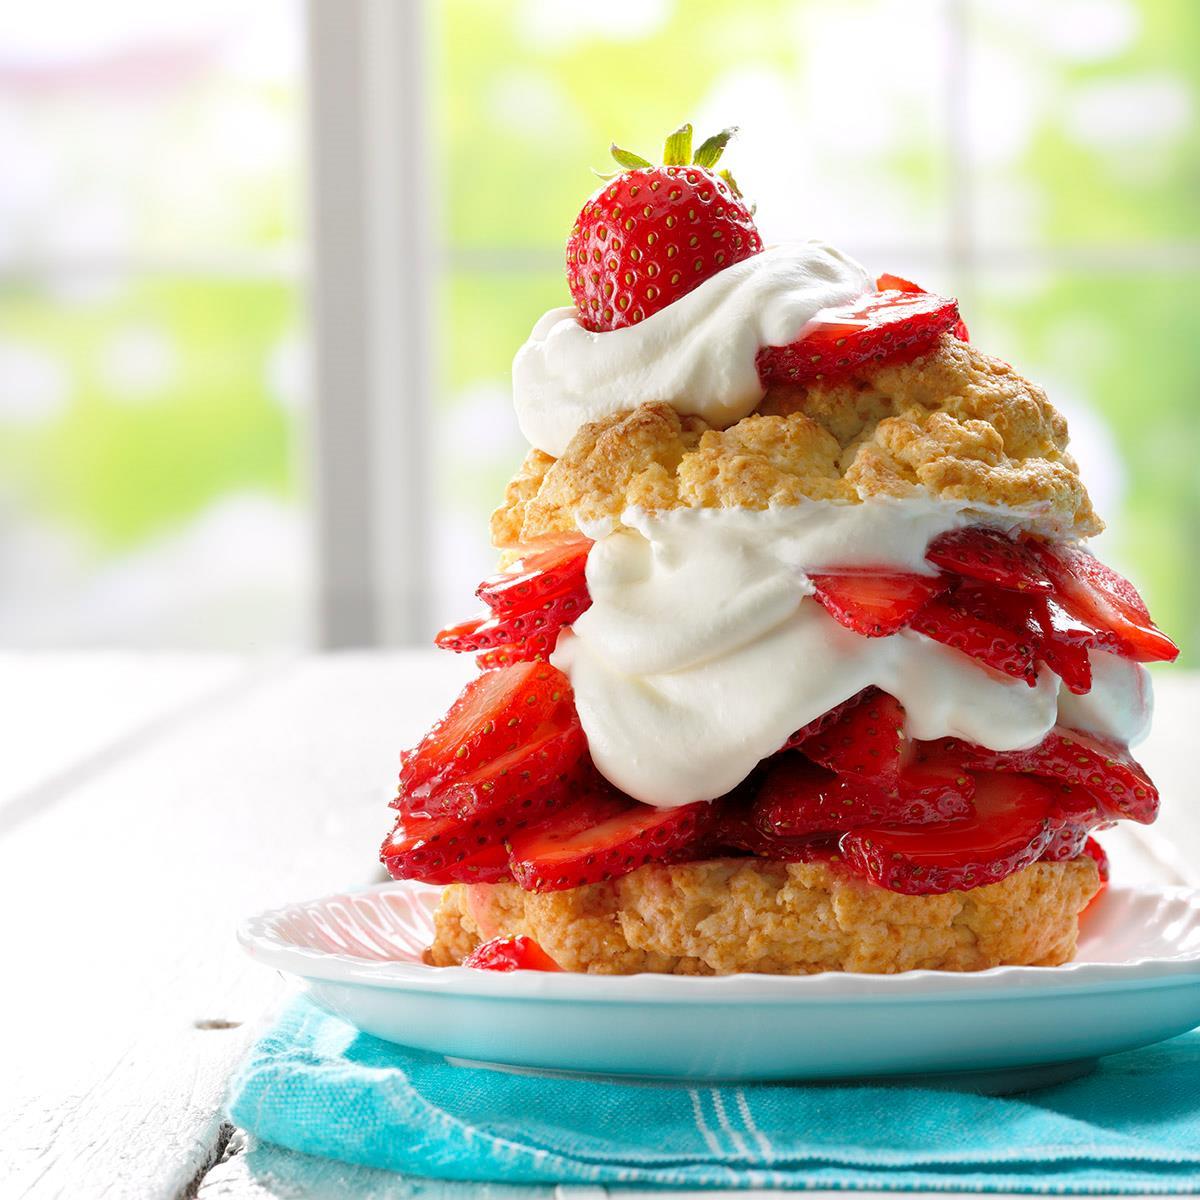 Grandma's Old-Fashioned Strawberry Shortcake image